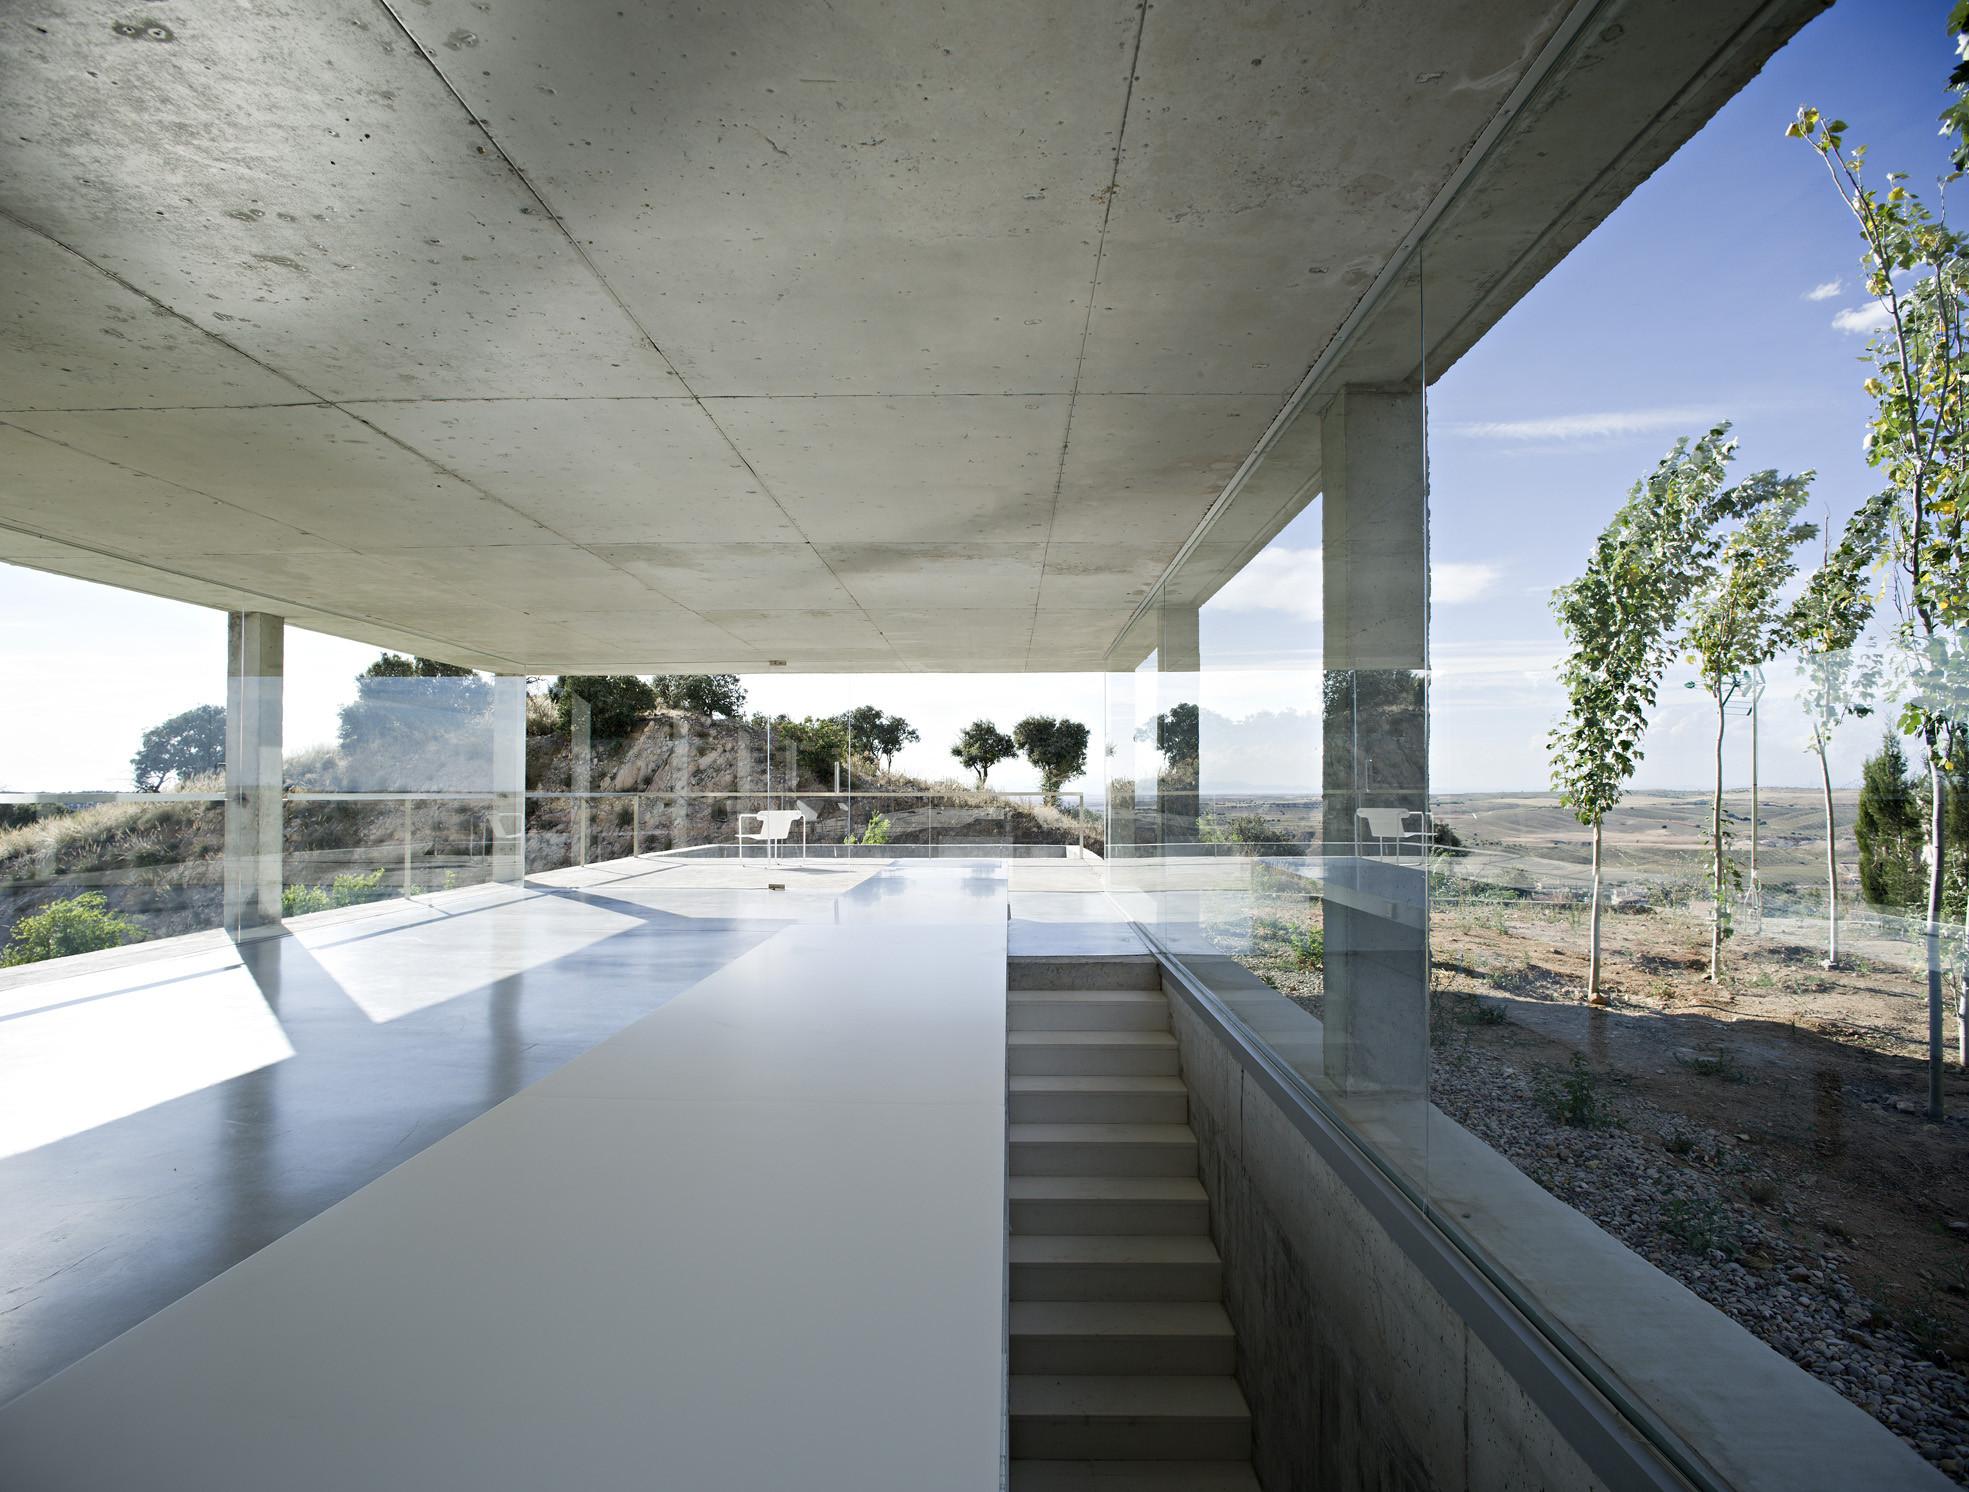 Gallery of rufo house alberto campo baeza 7 - Casa campo baeza ...